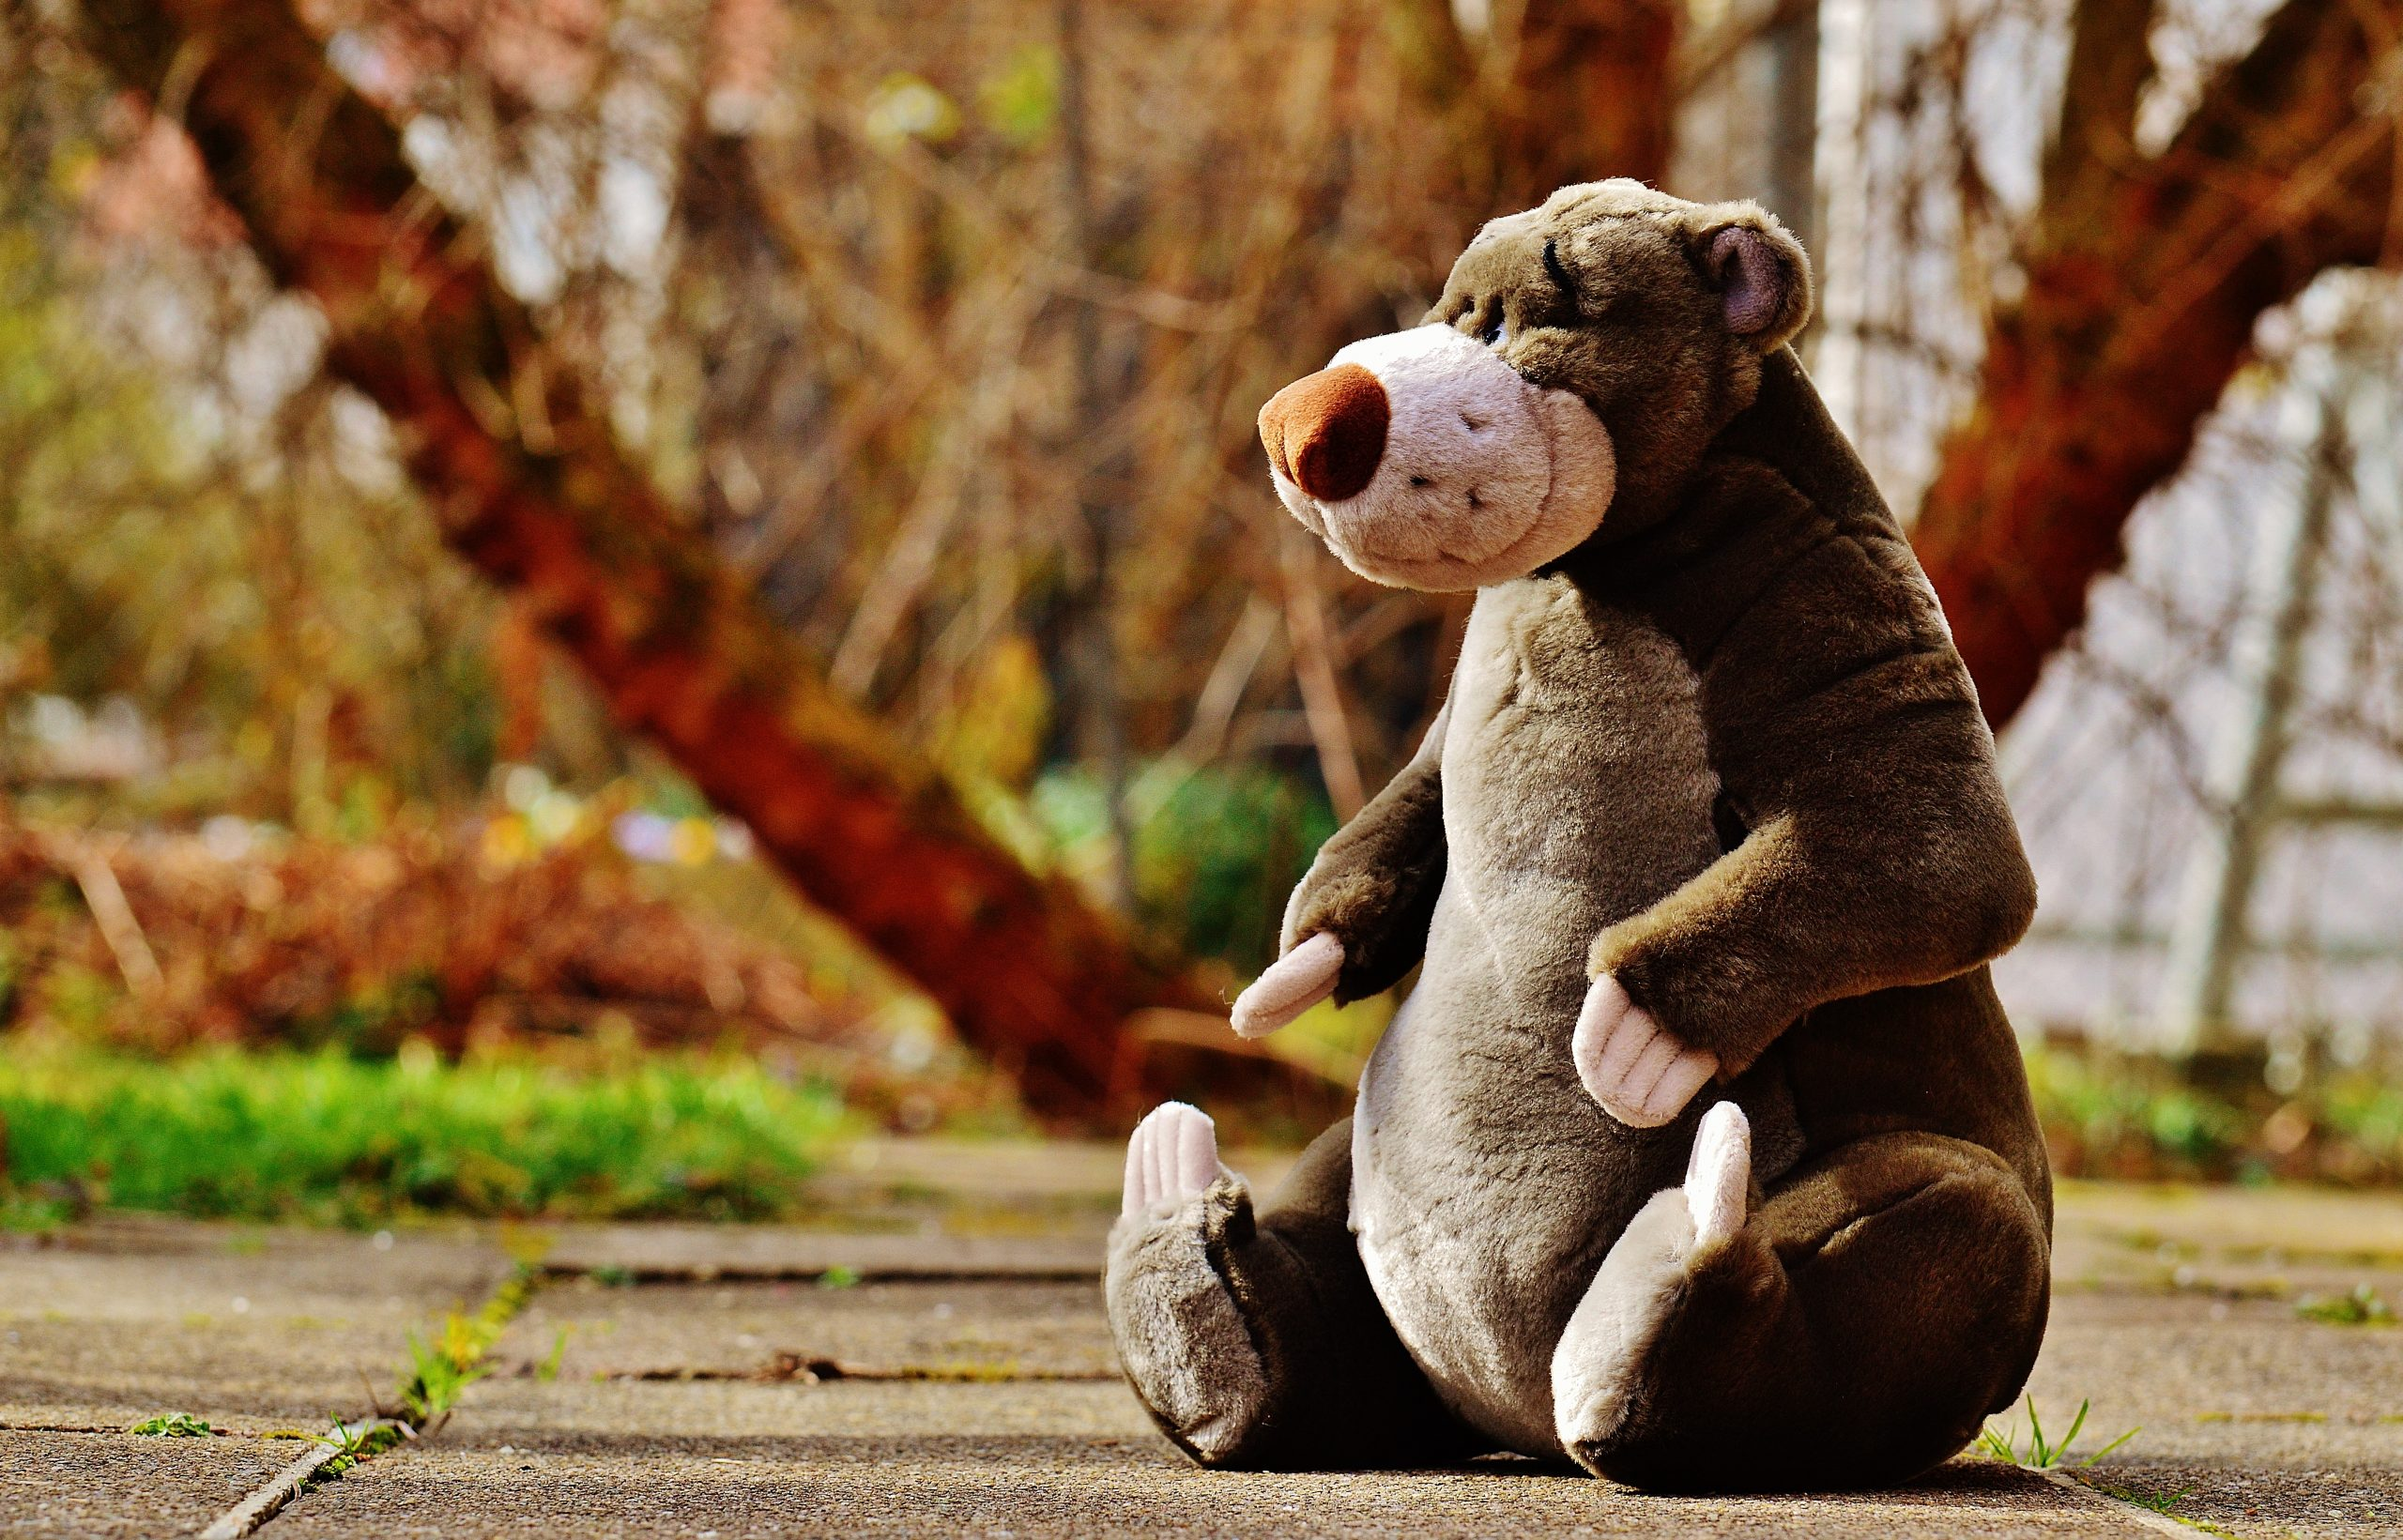 bear cute teddy